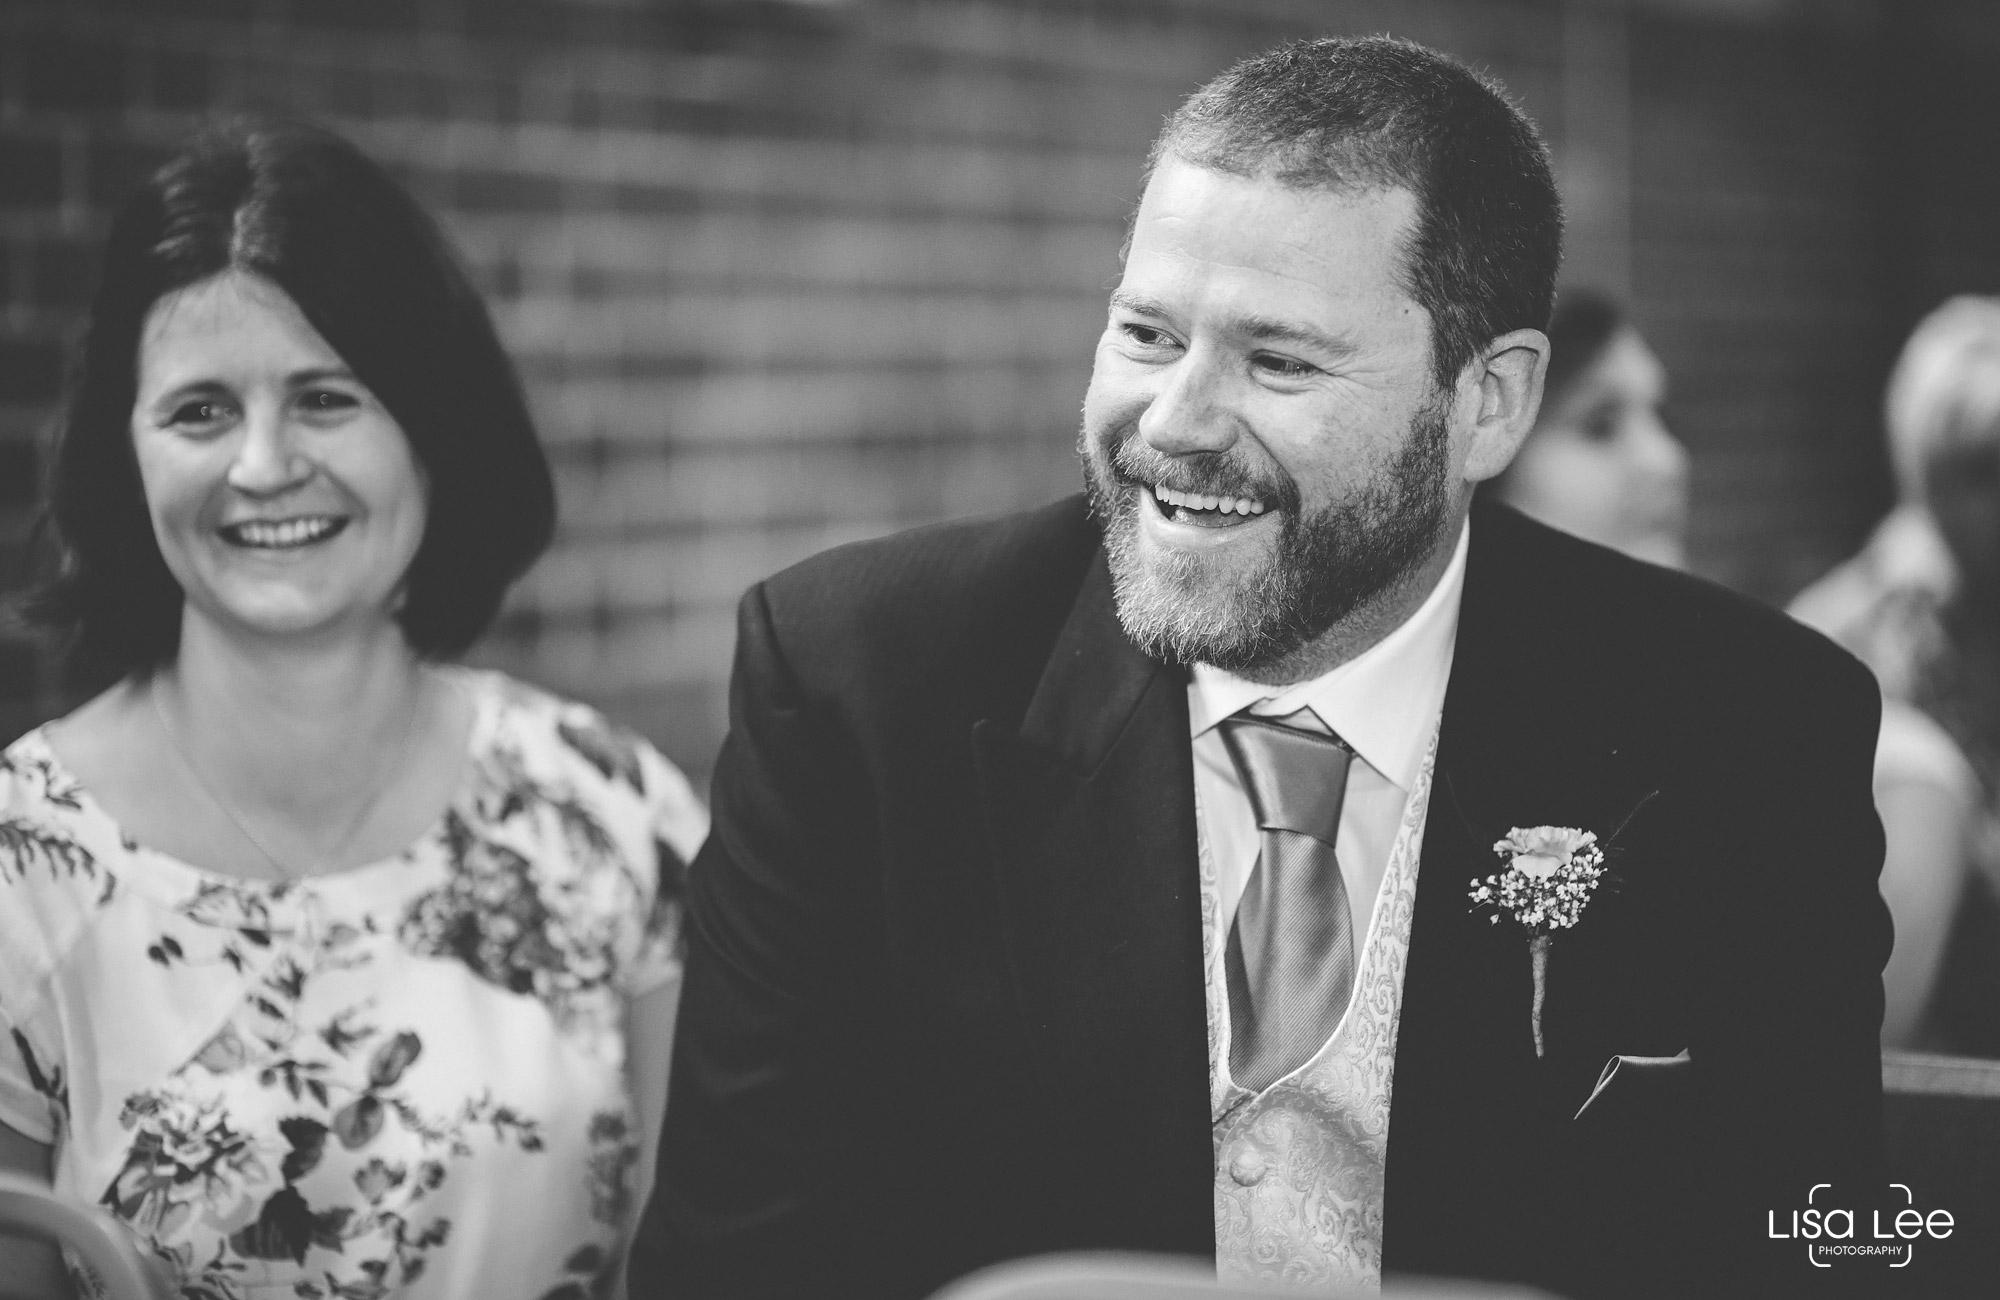 lisa-lee-wedding-photography-guests-4.jpg